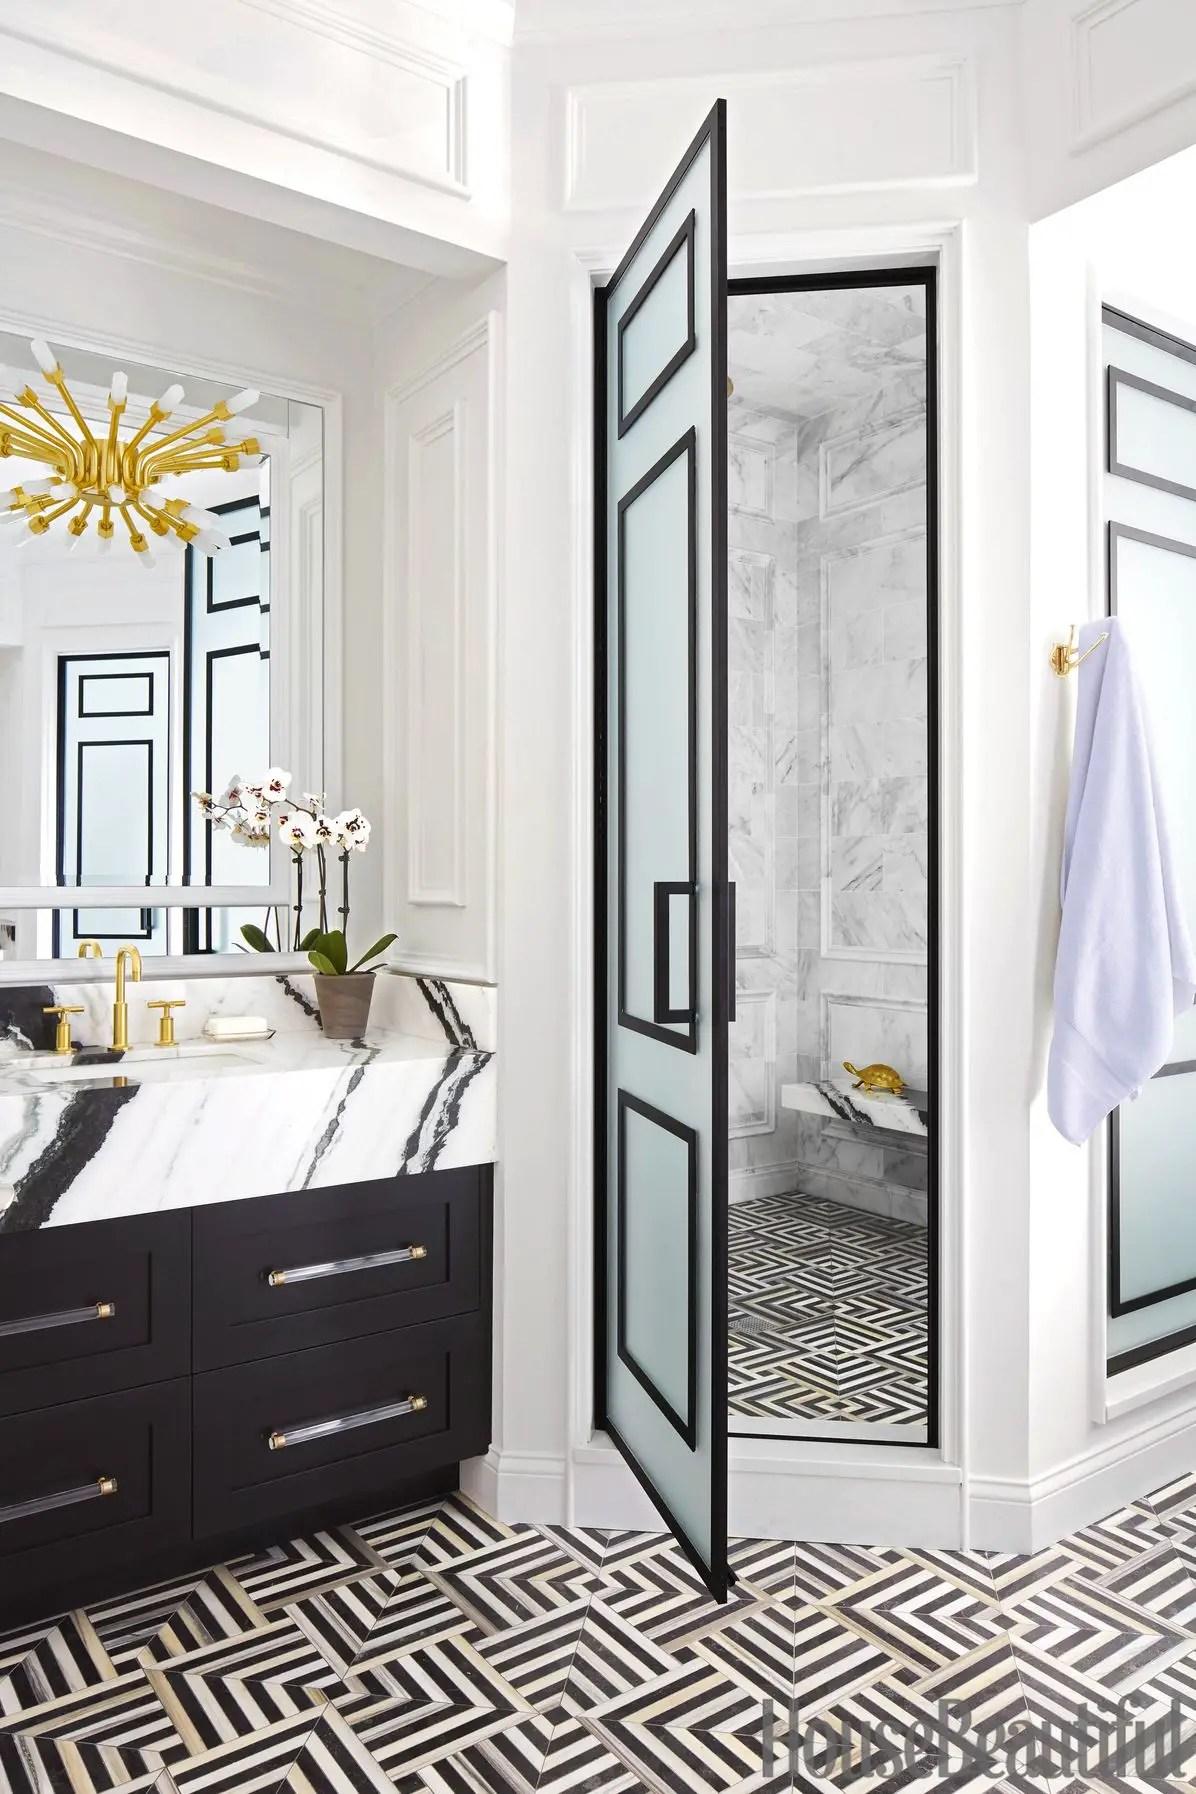 Geometric bathroom